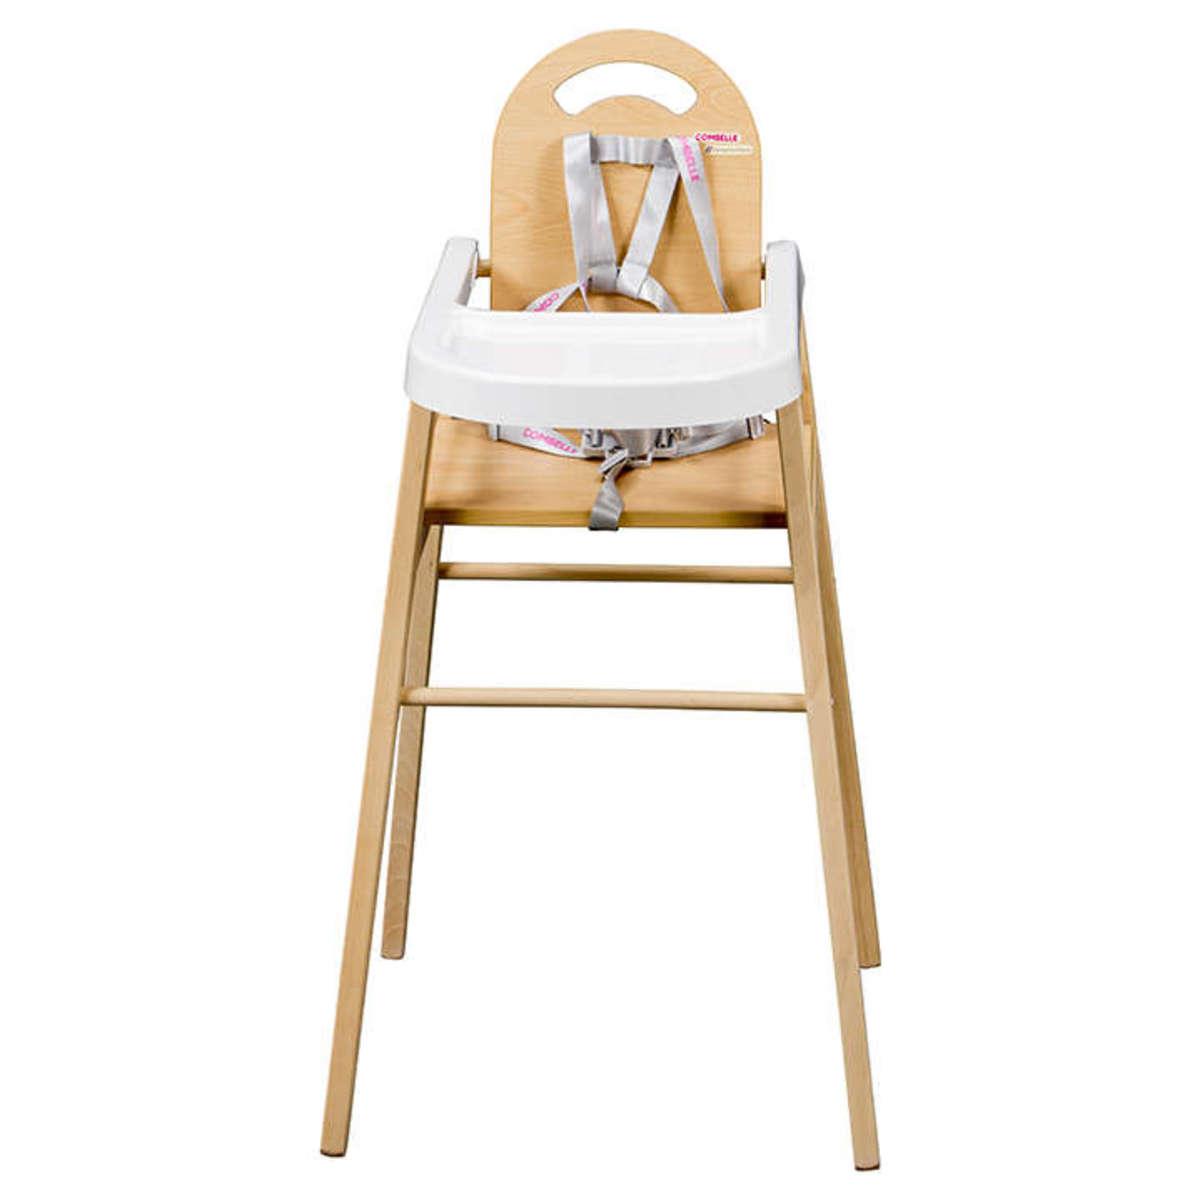 Combelle chaise haute fixe lili naturel chaise haute combelle sur l 39 armoire de b b - Chaise haute lili combelle ...